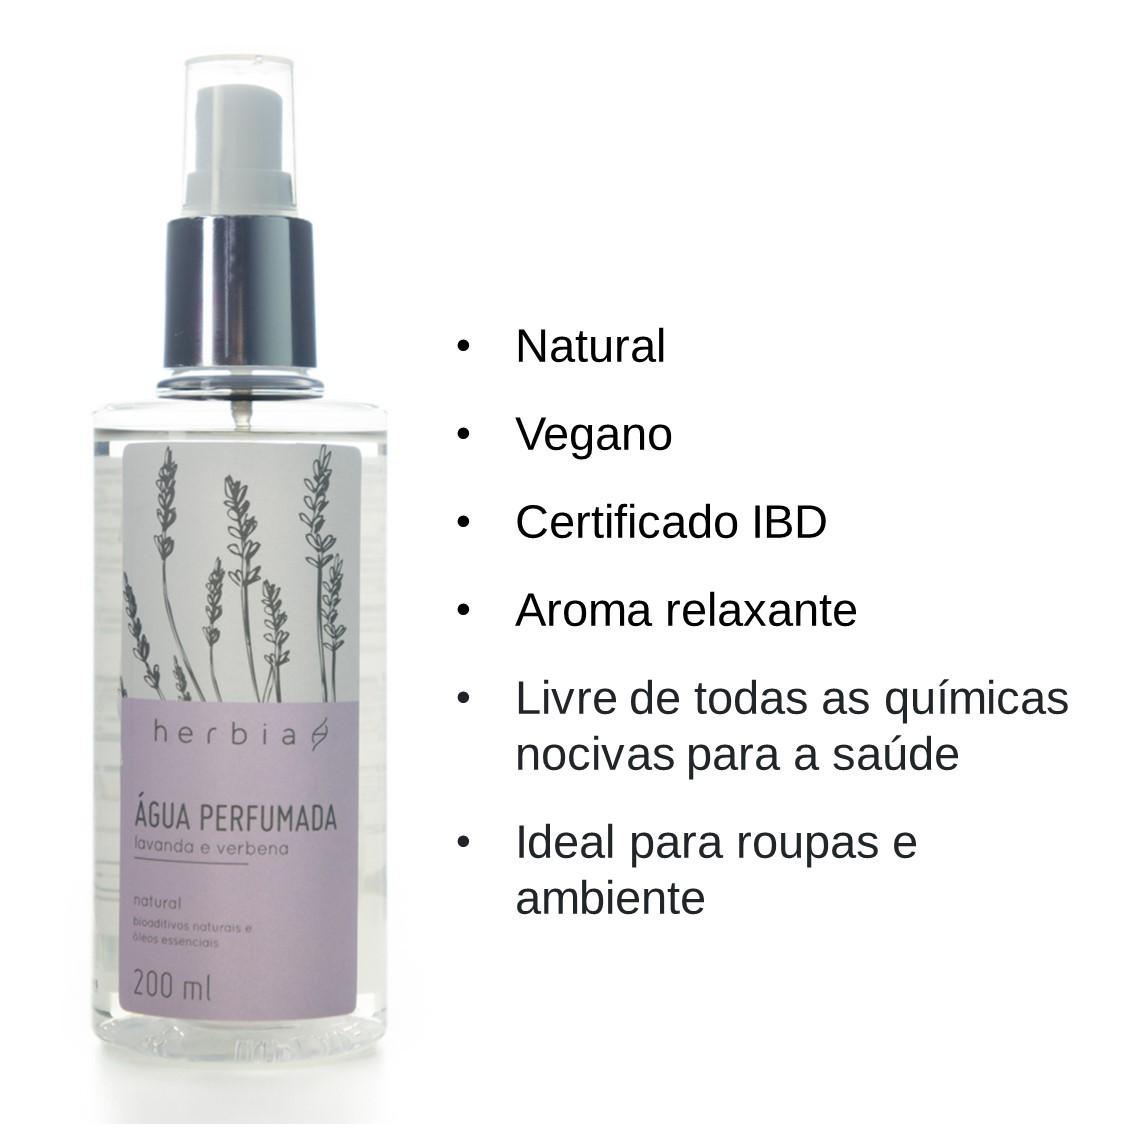 Água Perfumada Lavanda & Verbena Certificado IBD